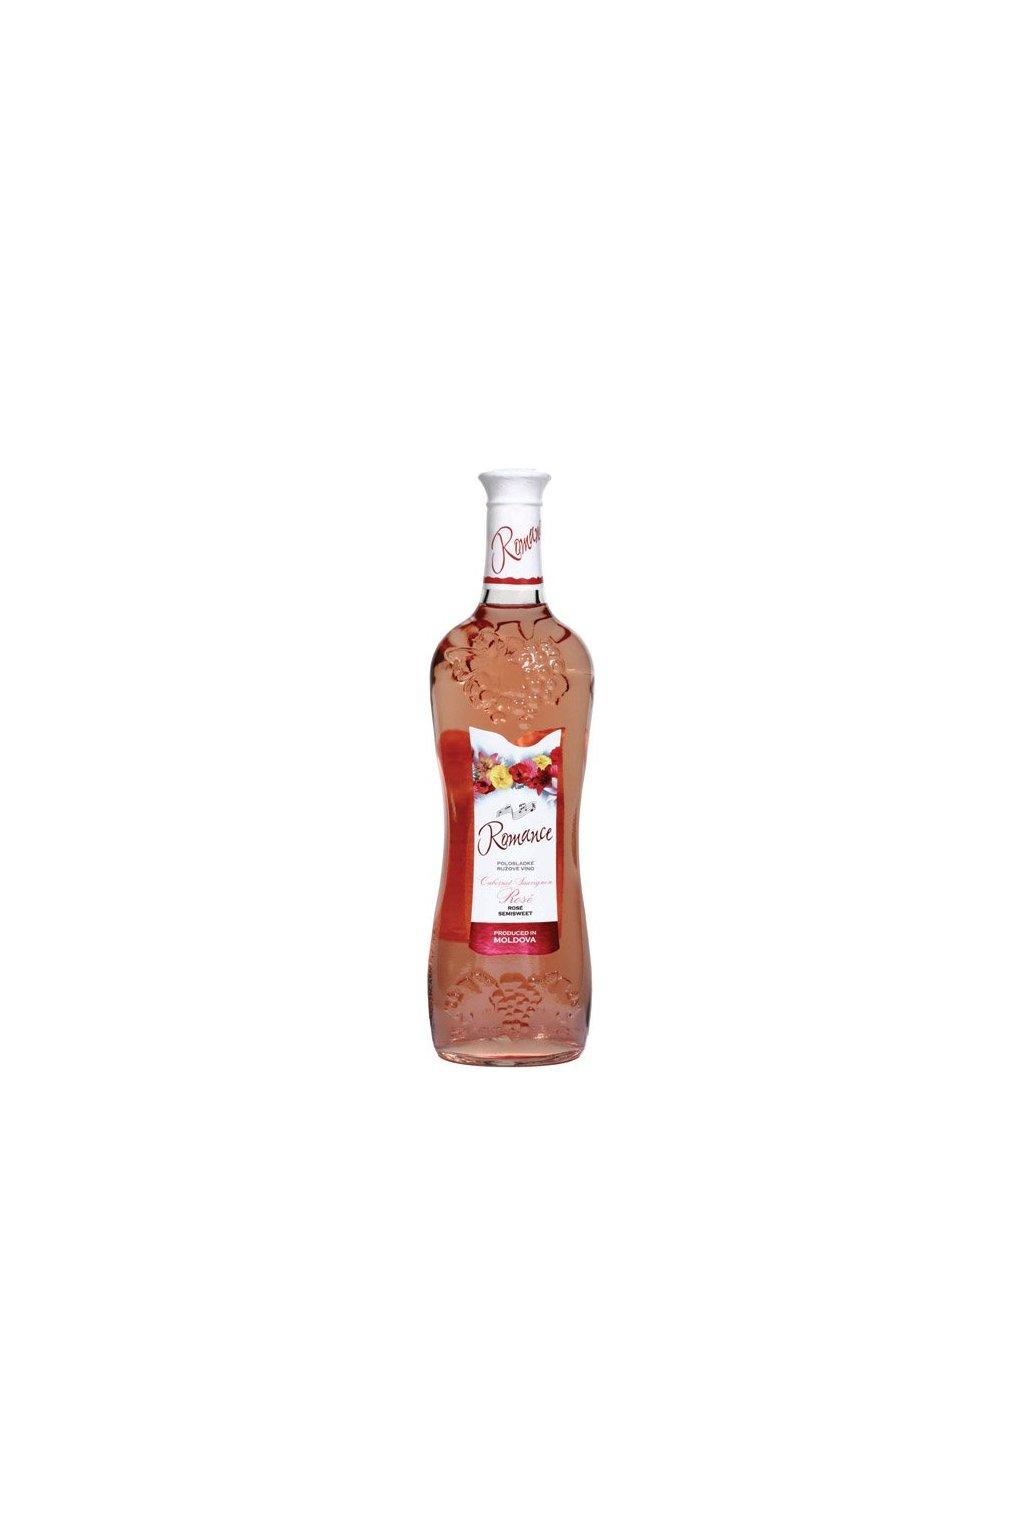 basavin romance cabernet rose